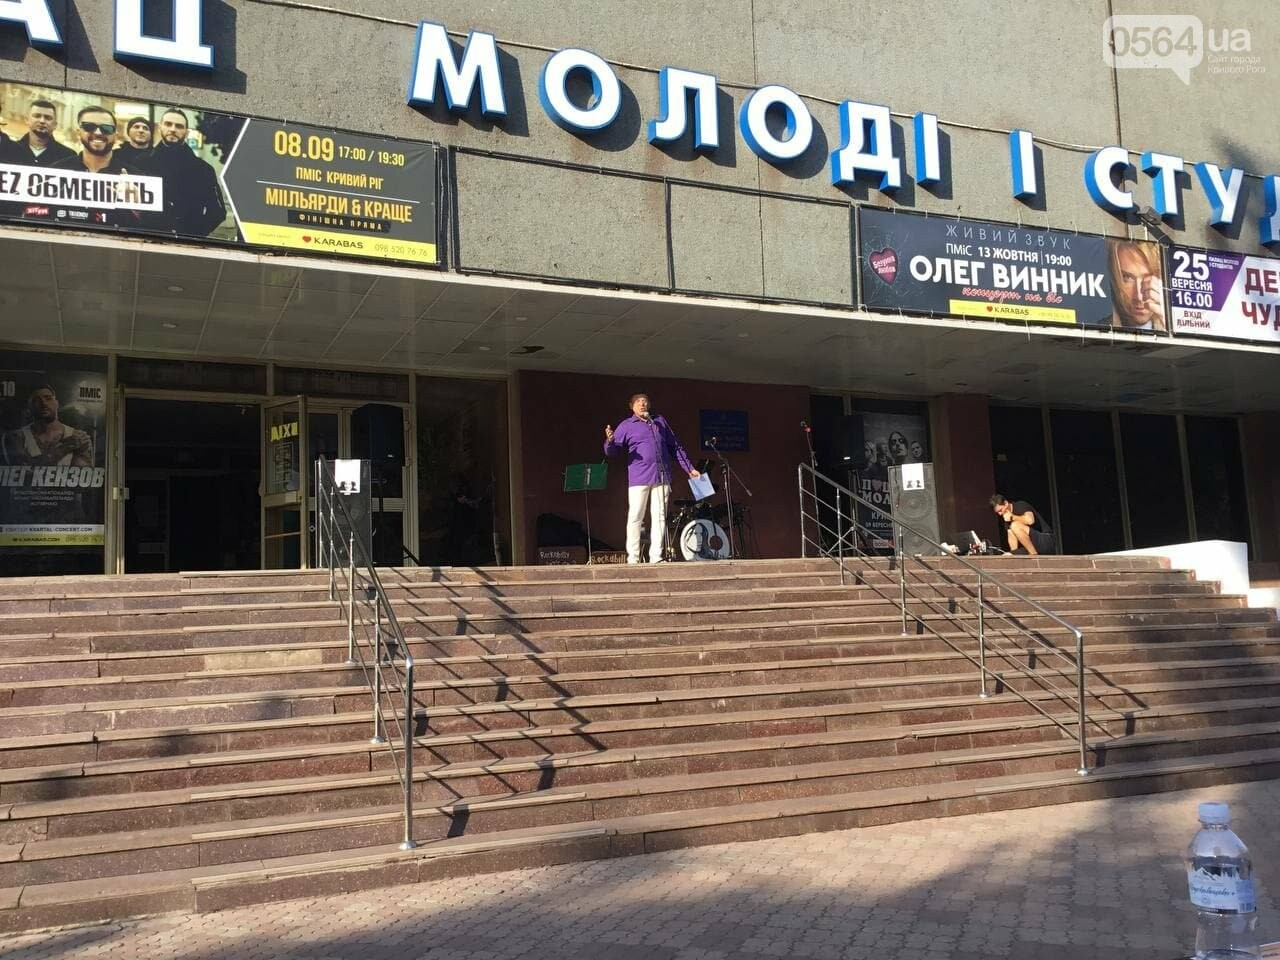 18 конкурсантов представили своё творчество на 5-м Криворожском фестивале имени Кузьмы Скрябина, - ФОТО, ВИДЕО, фото-17